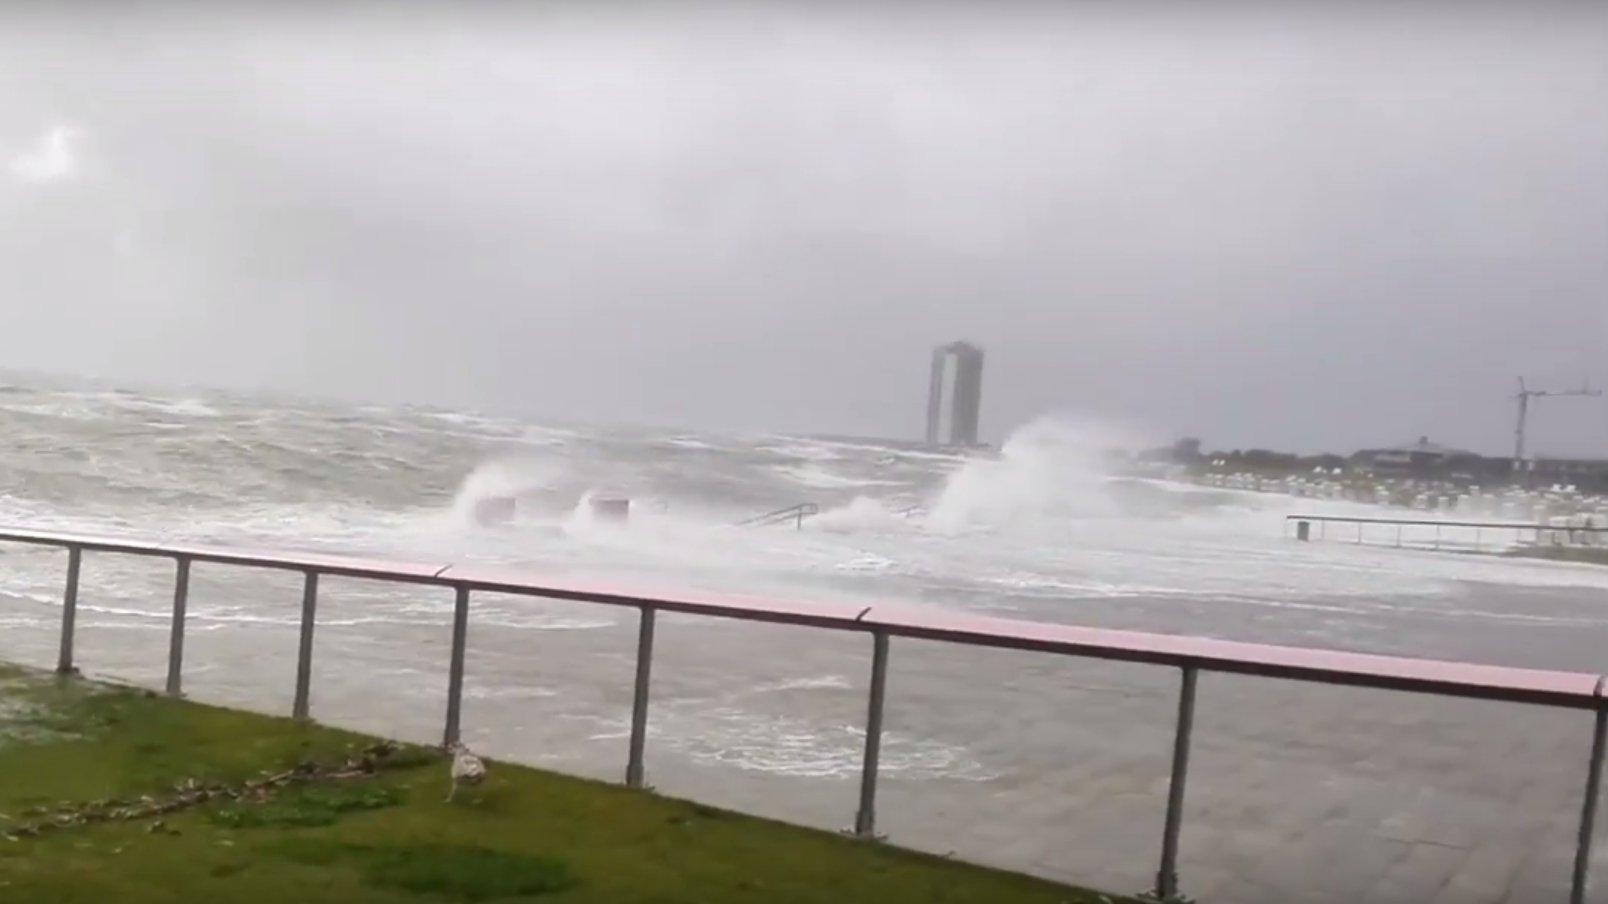 So wütet Sturm Sebastian an der Nordseeküste